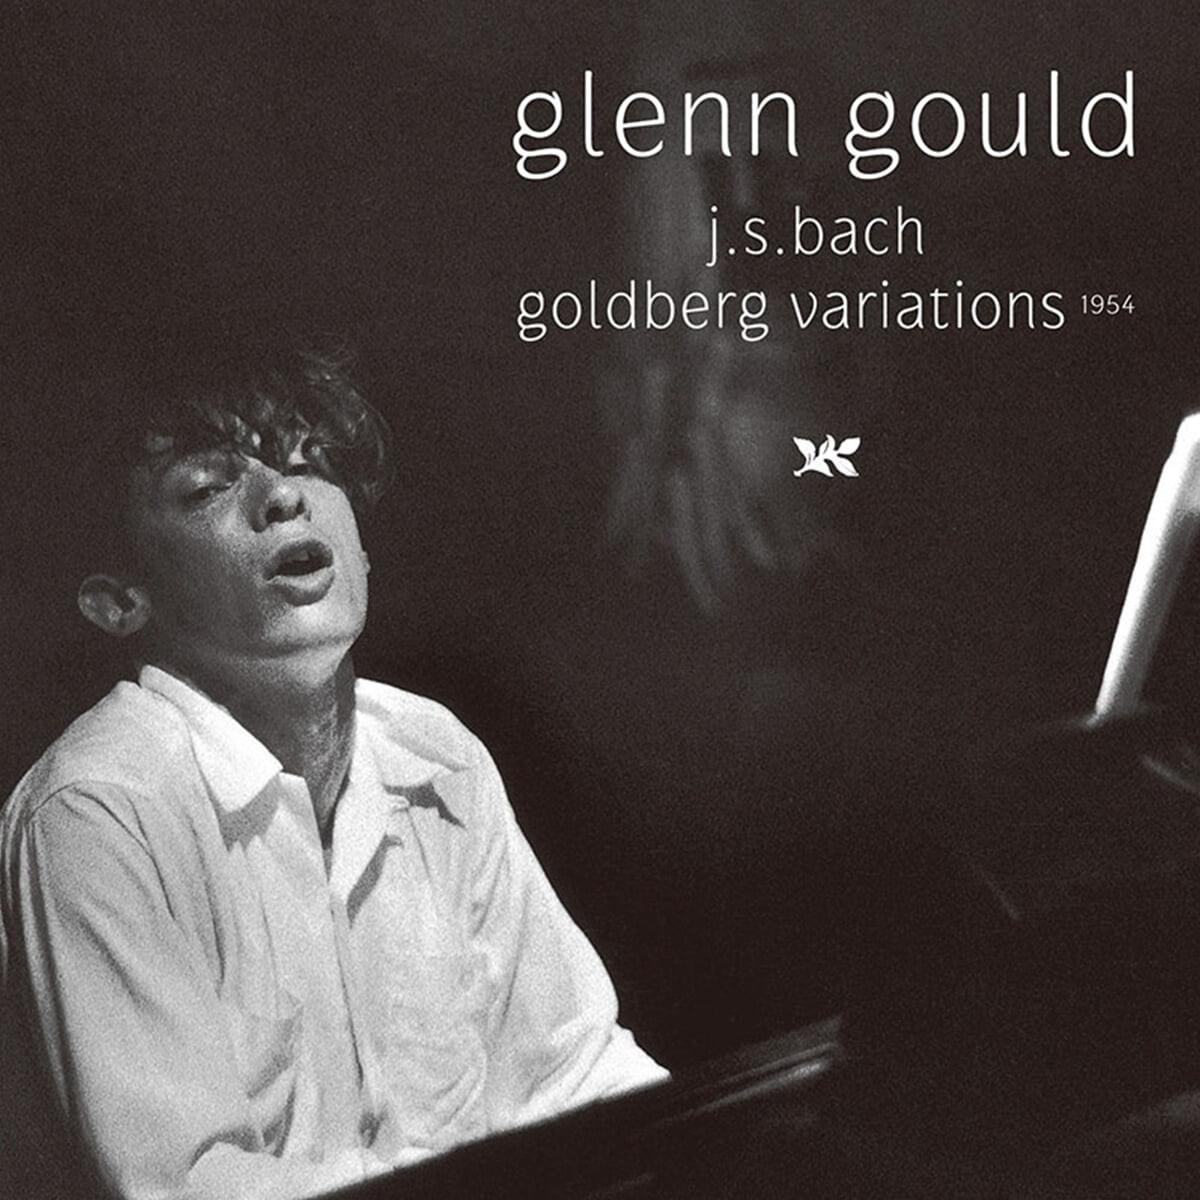 Glenn Gould 바흐: 골드베르그 변주곡 - 글렌 굴드 (Bach: Goldberg Variations BWV988)